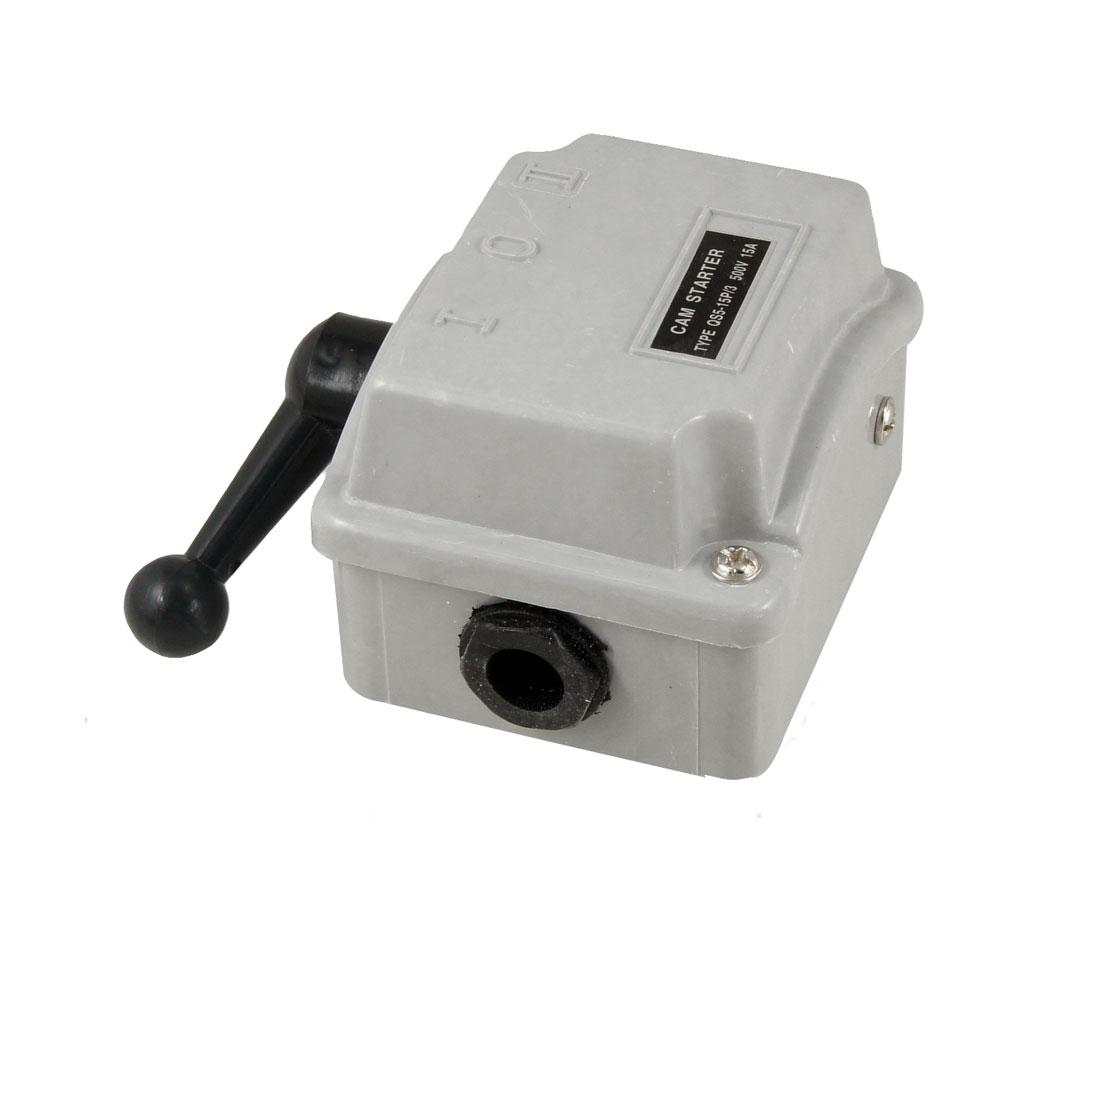 500V 15A 2 Position 3 Pole Motor Starter Protector Gray